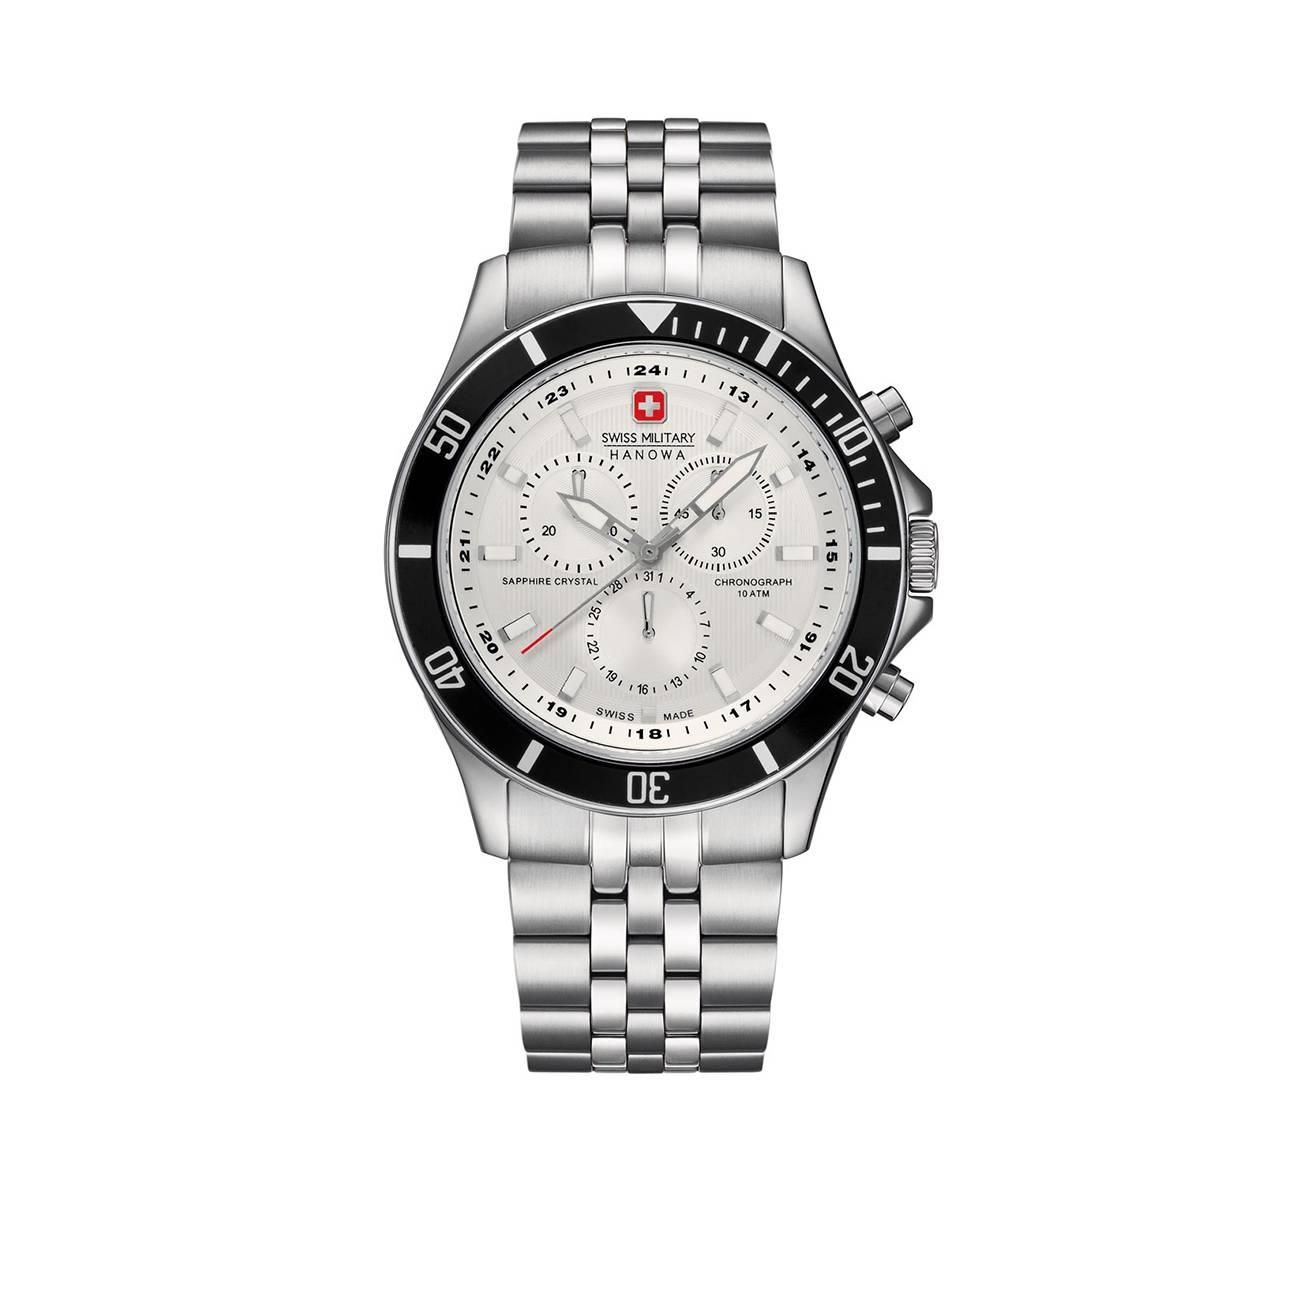 Hanowa Flagship Chronograph Watch 6-5183.04.001.07 imagine